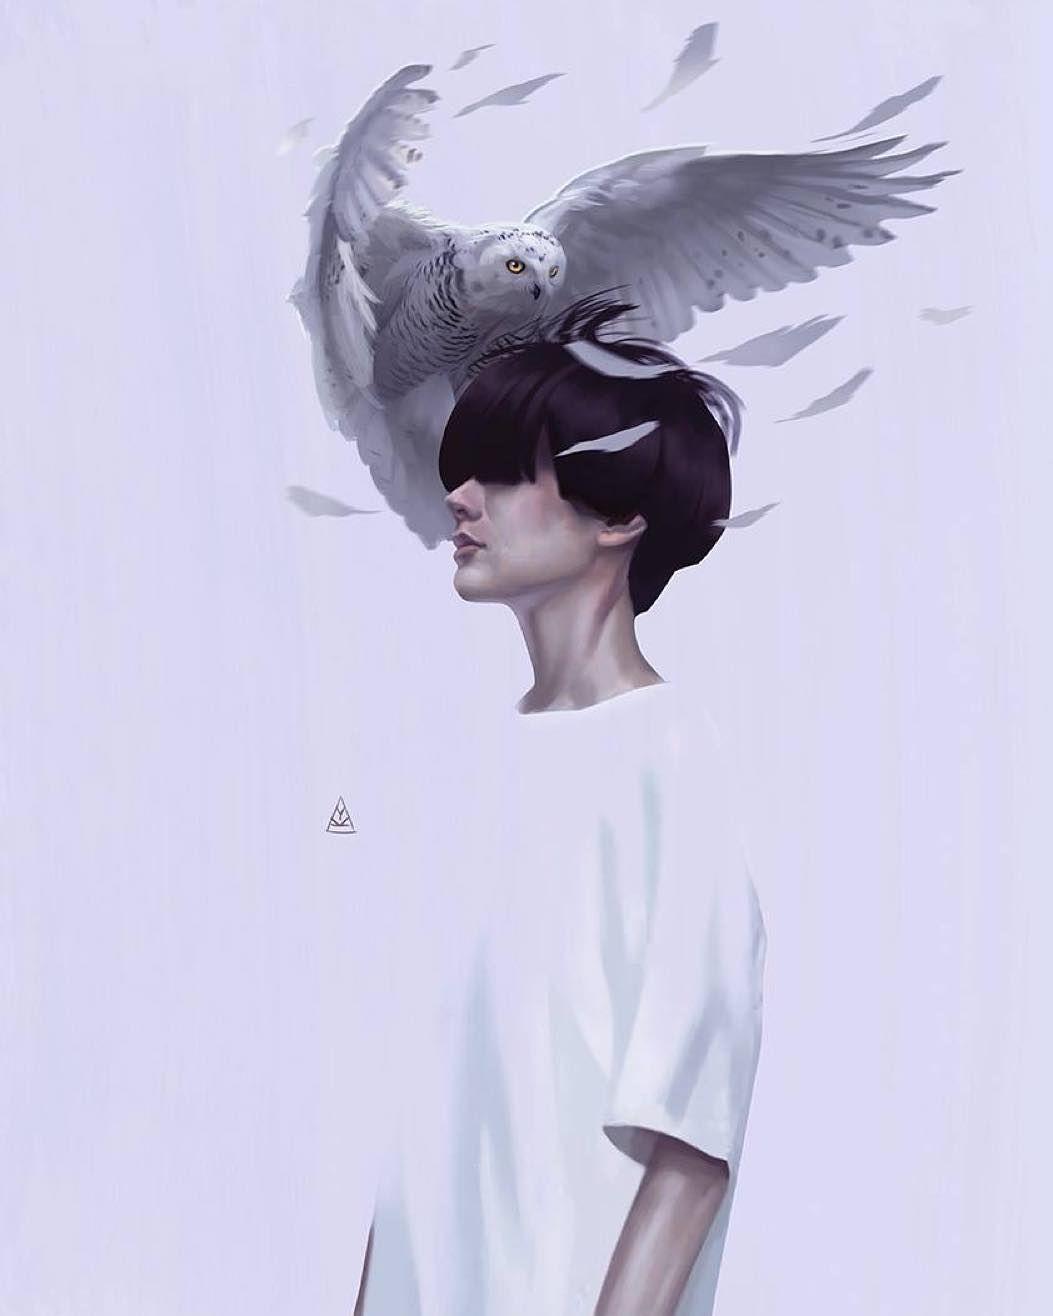 Aykutaydogdu On Instagram Broken Home Boy Art Conceptual Illustration Artwork